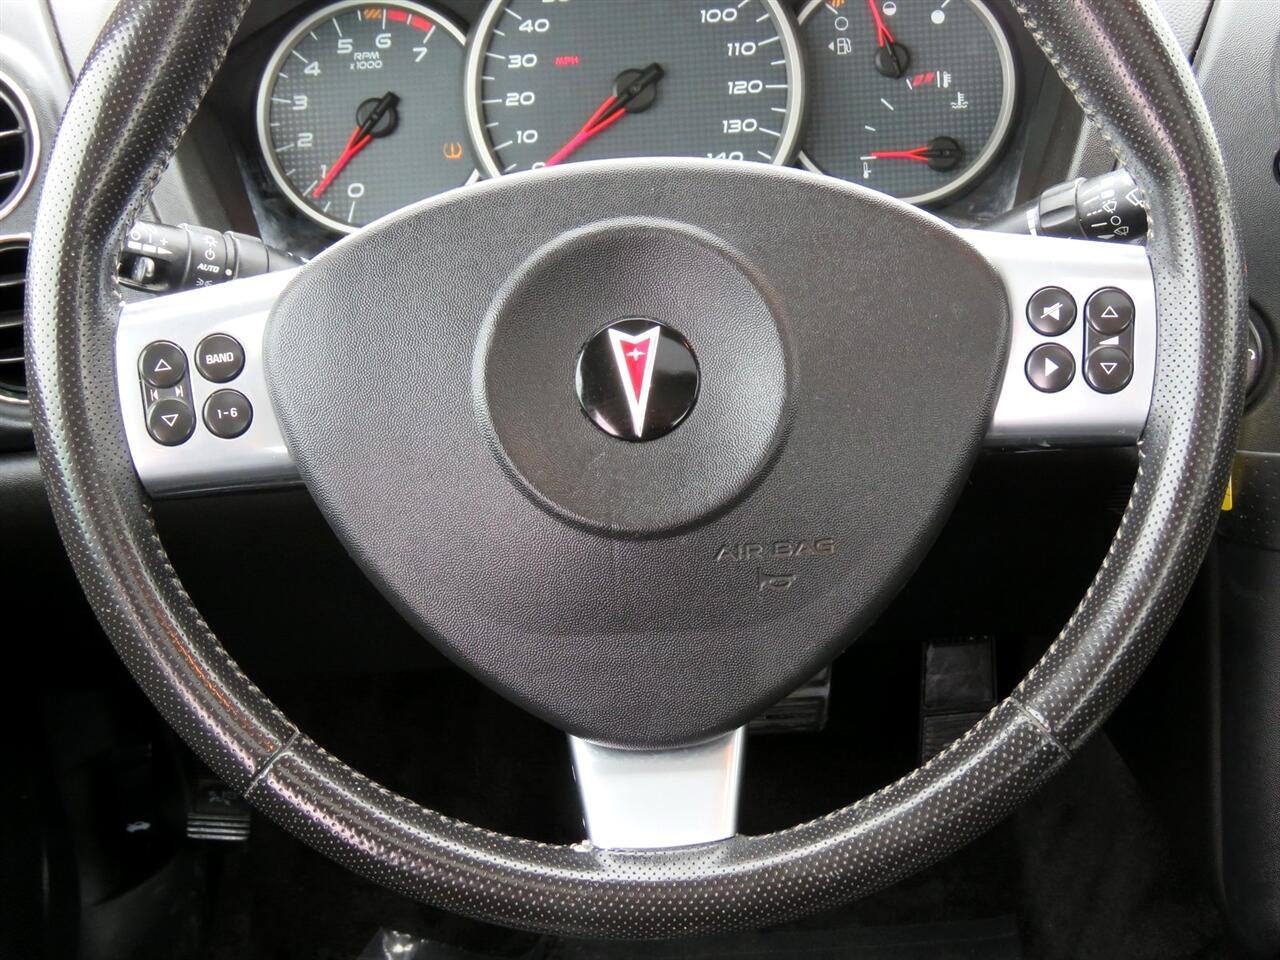 2008 Pontiac Grand Prix